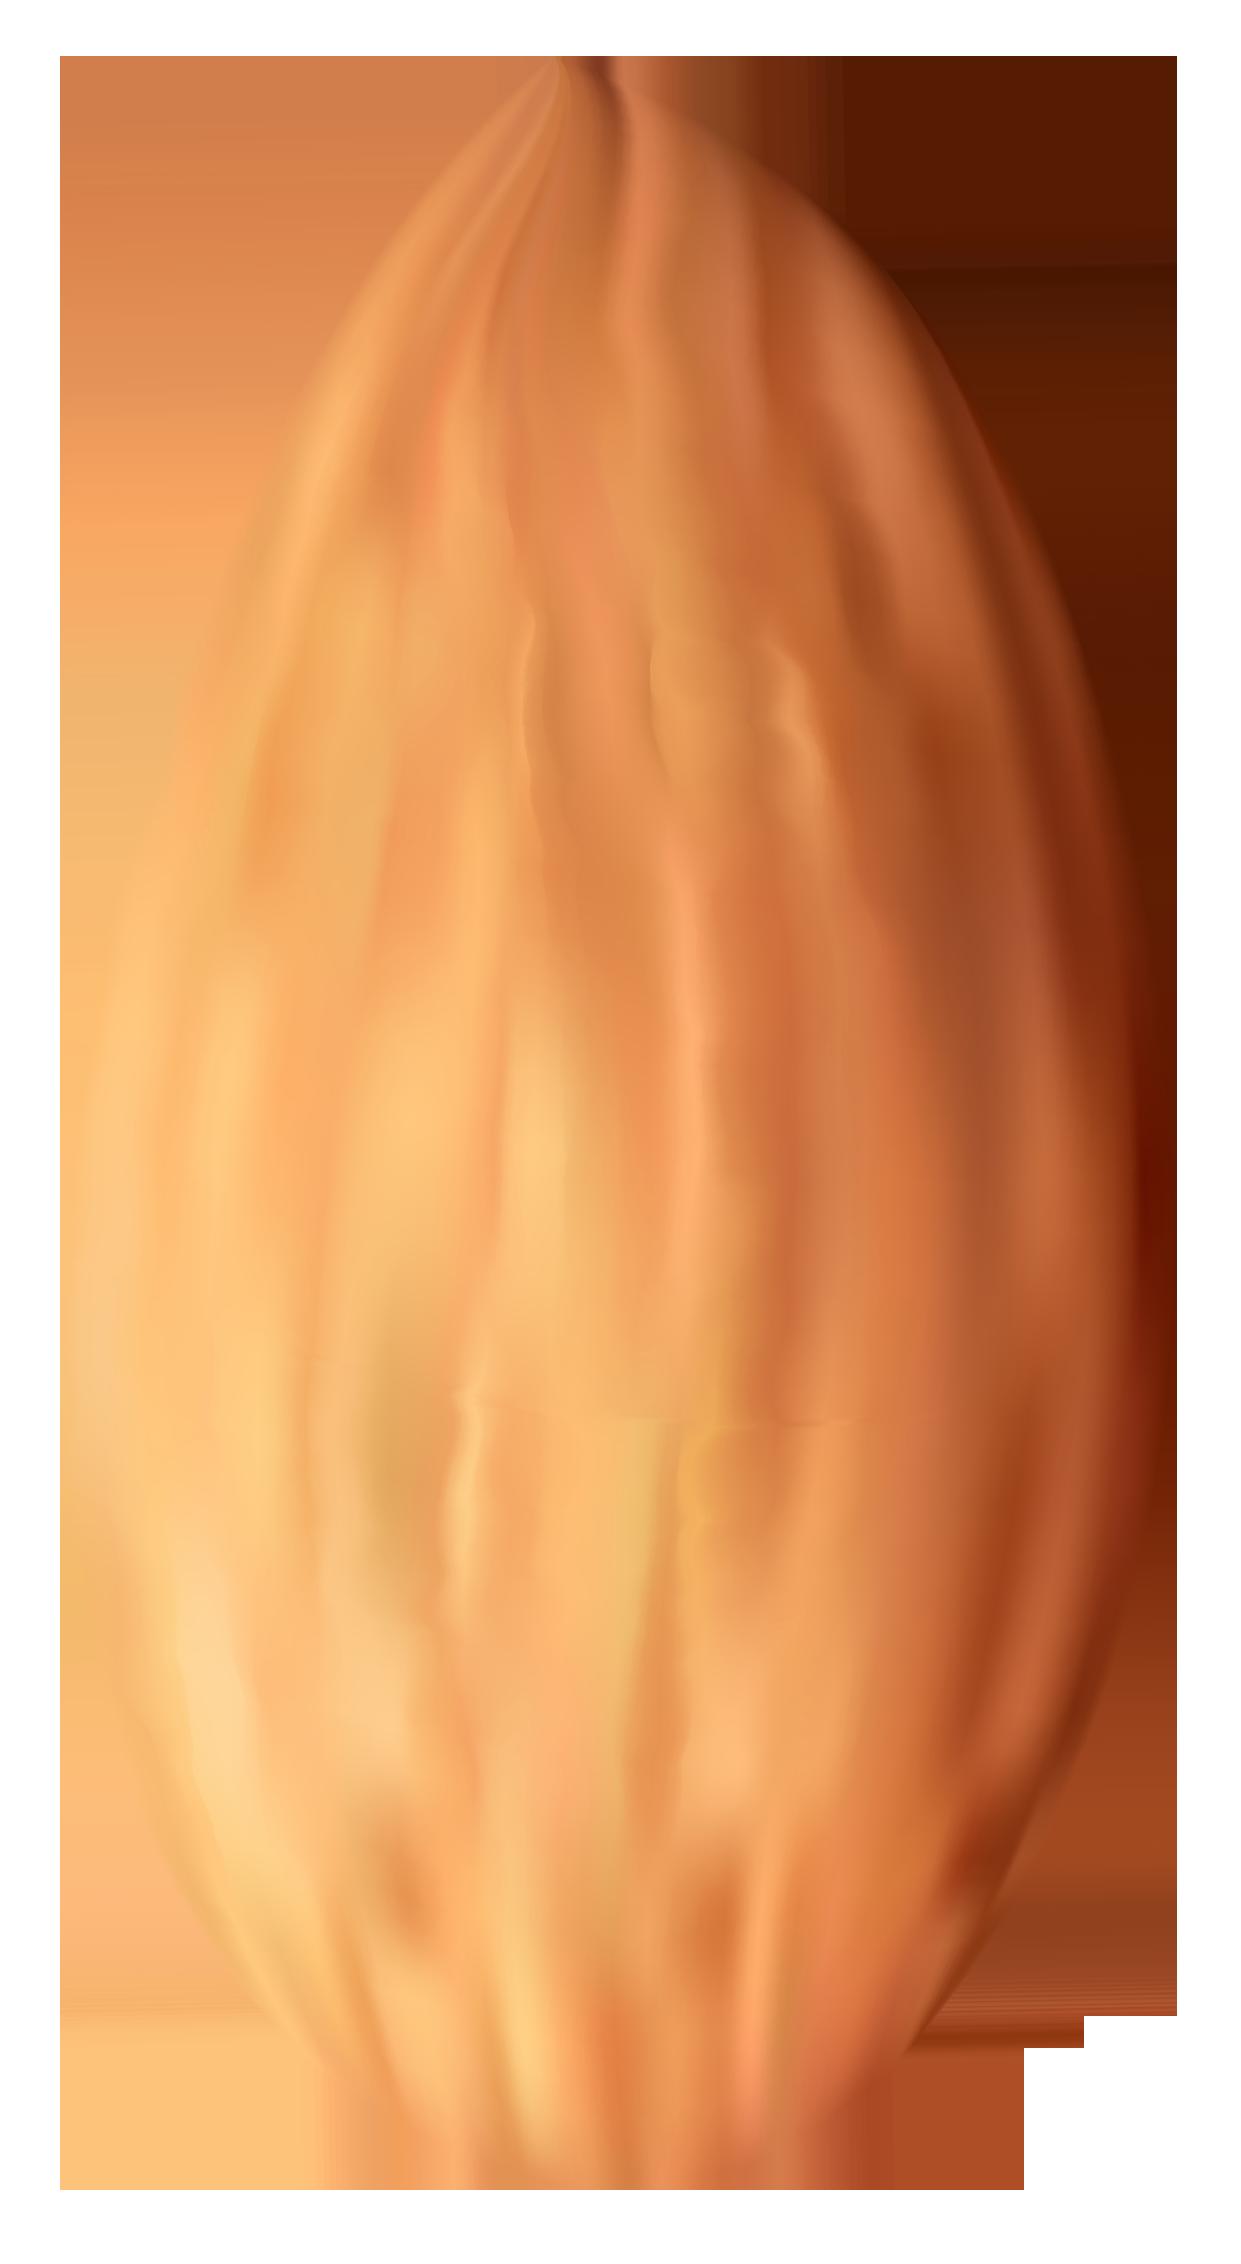 Nut clipart Nut Clipart PNG Clipart Best